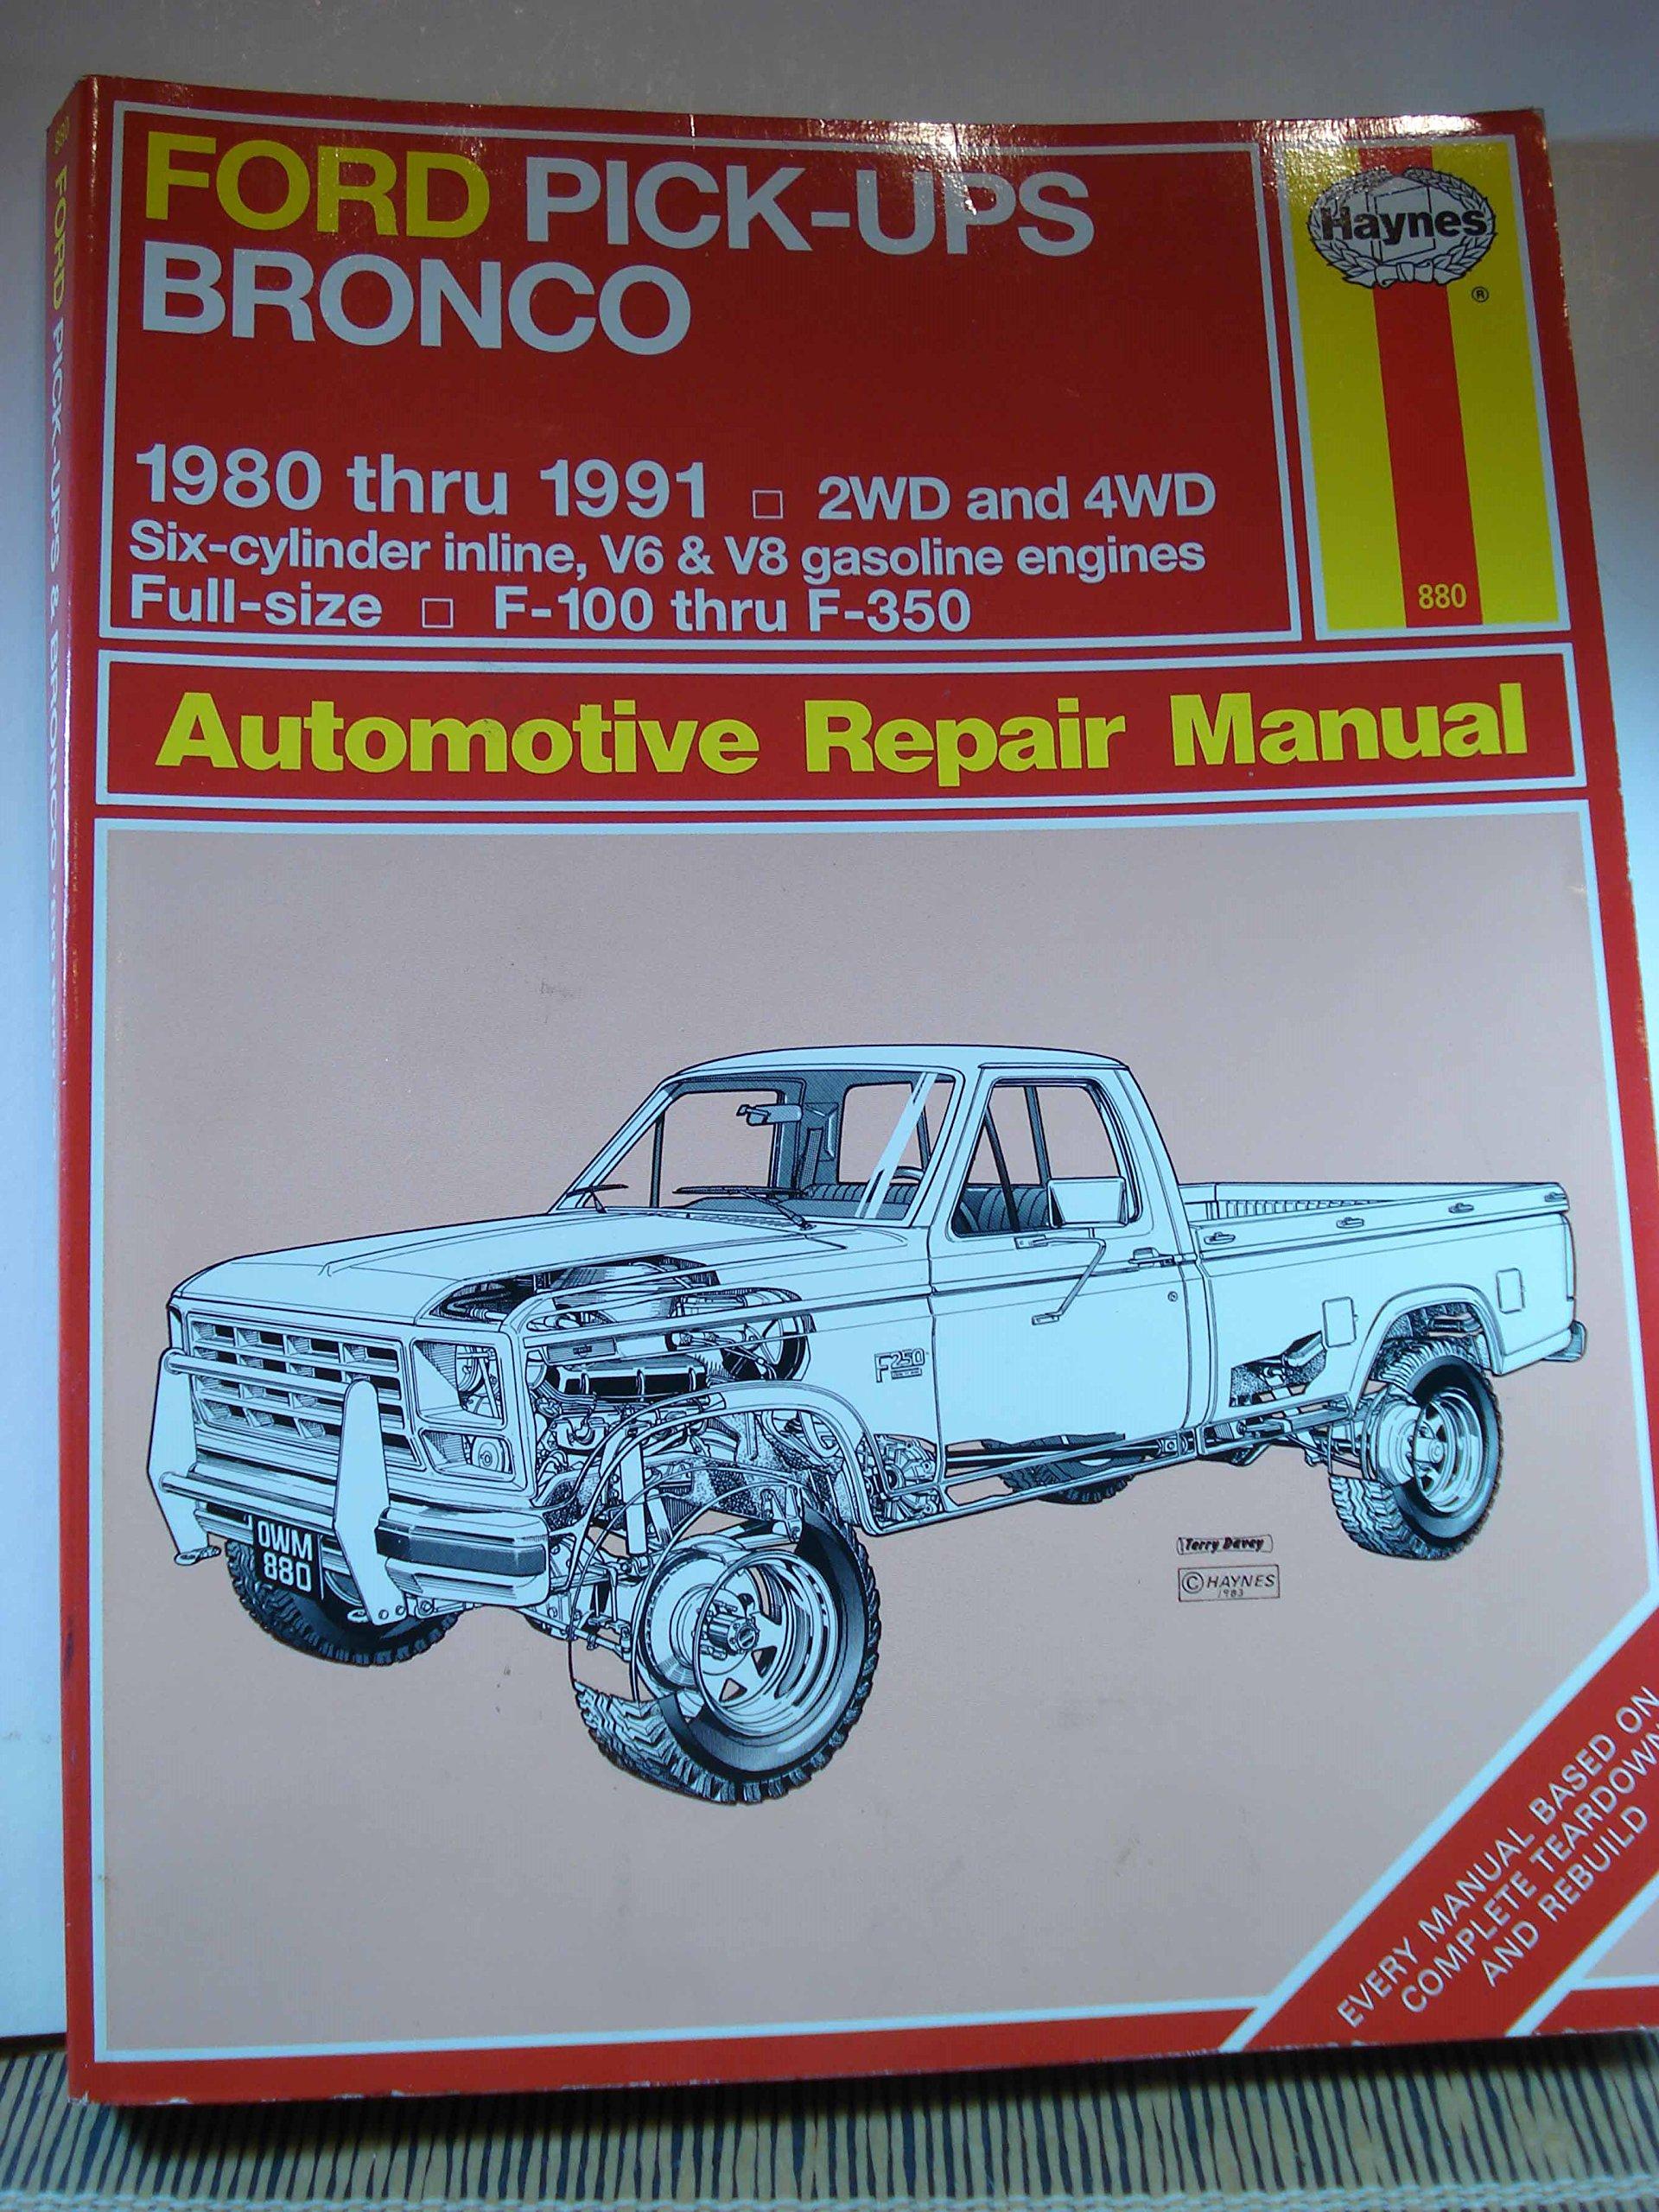 Ford Pick Ups And Bronco 1980 1991 Automotive Repair Manual John Full Size B Raffa J H Haynes 9781563920097 Books